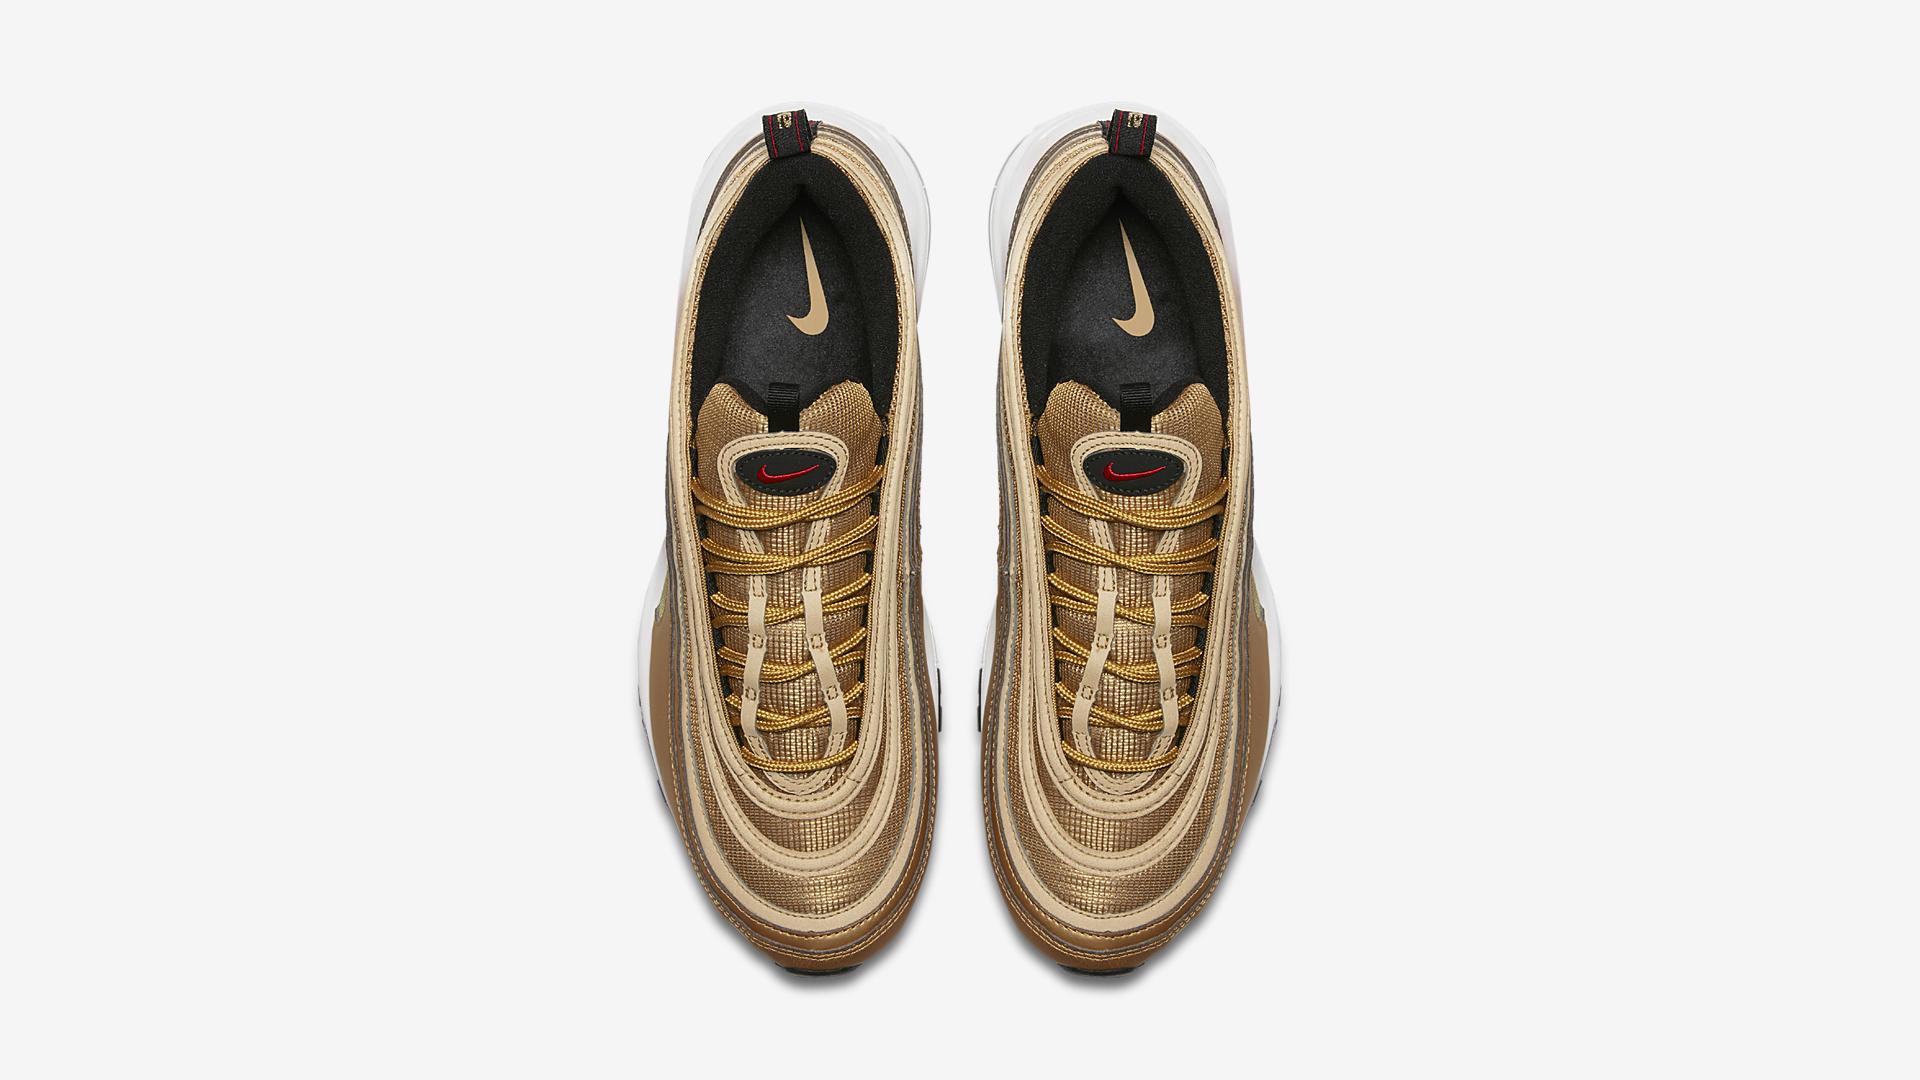 Nike Air Max 97 COS Homme Chaussures Foot Locker Belgi